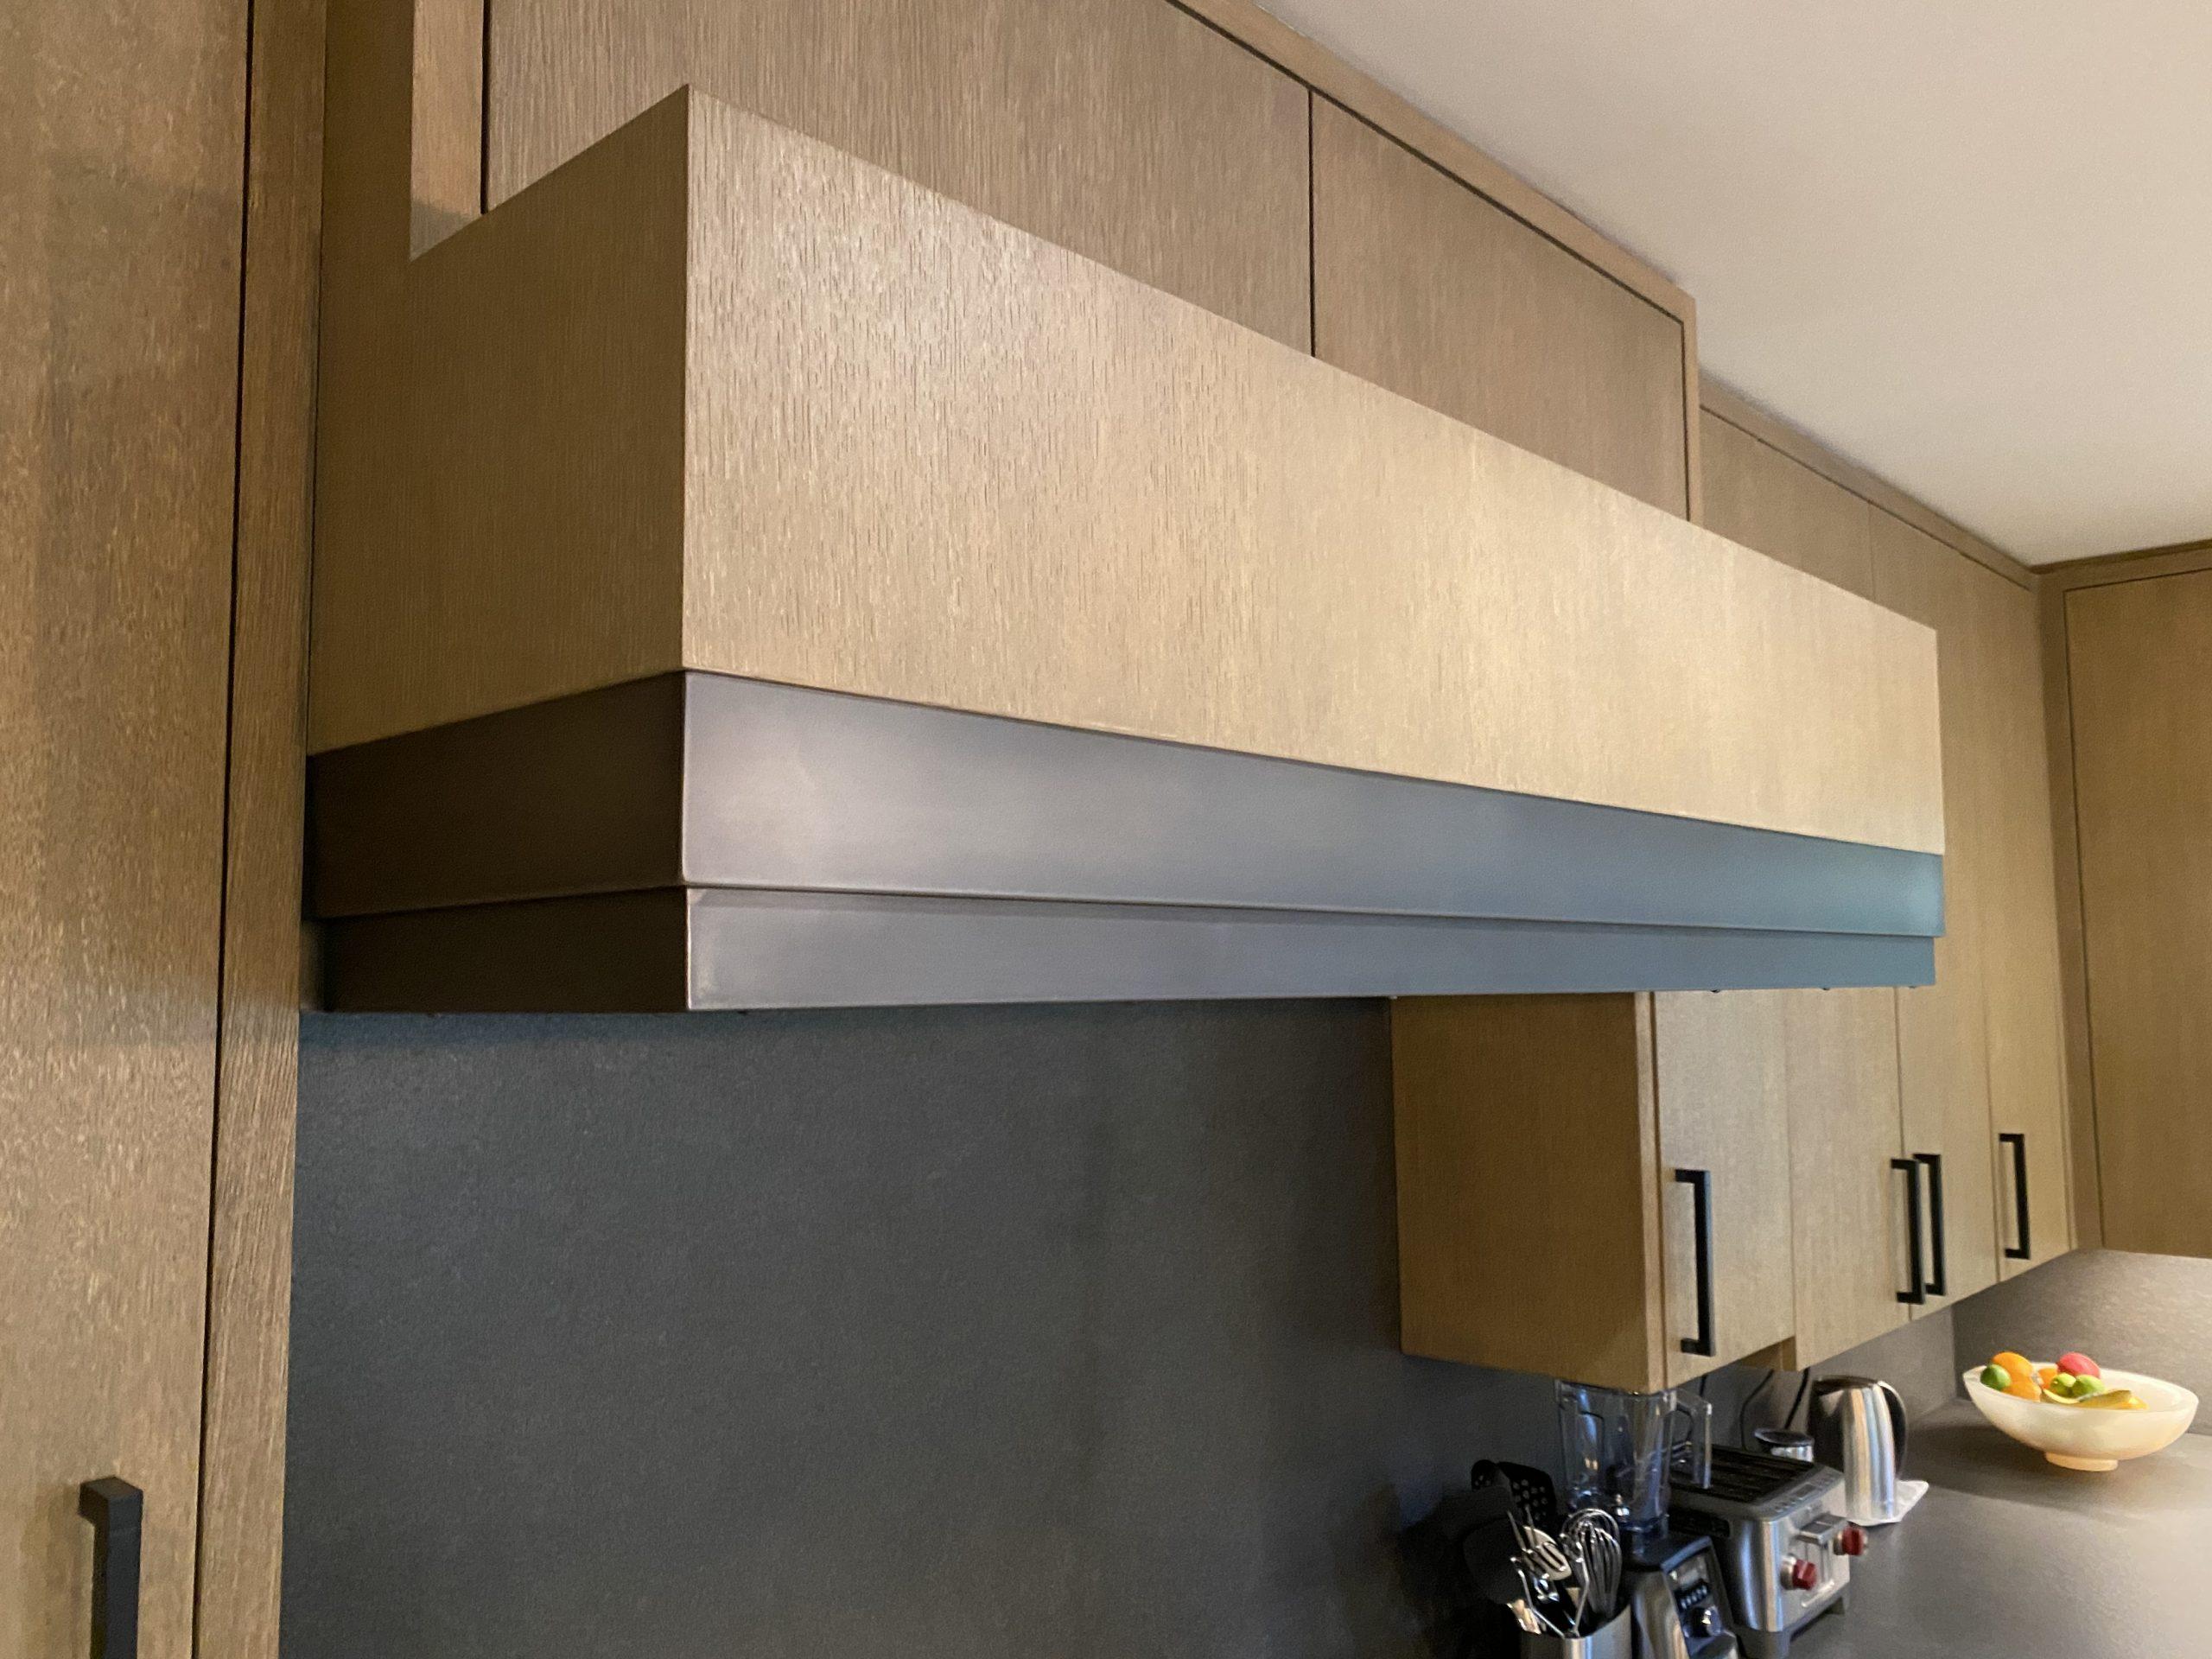 mw design workshop custom oven hood